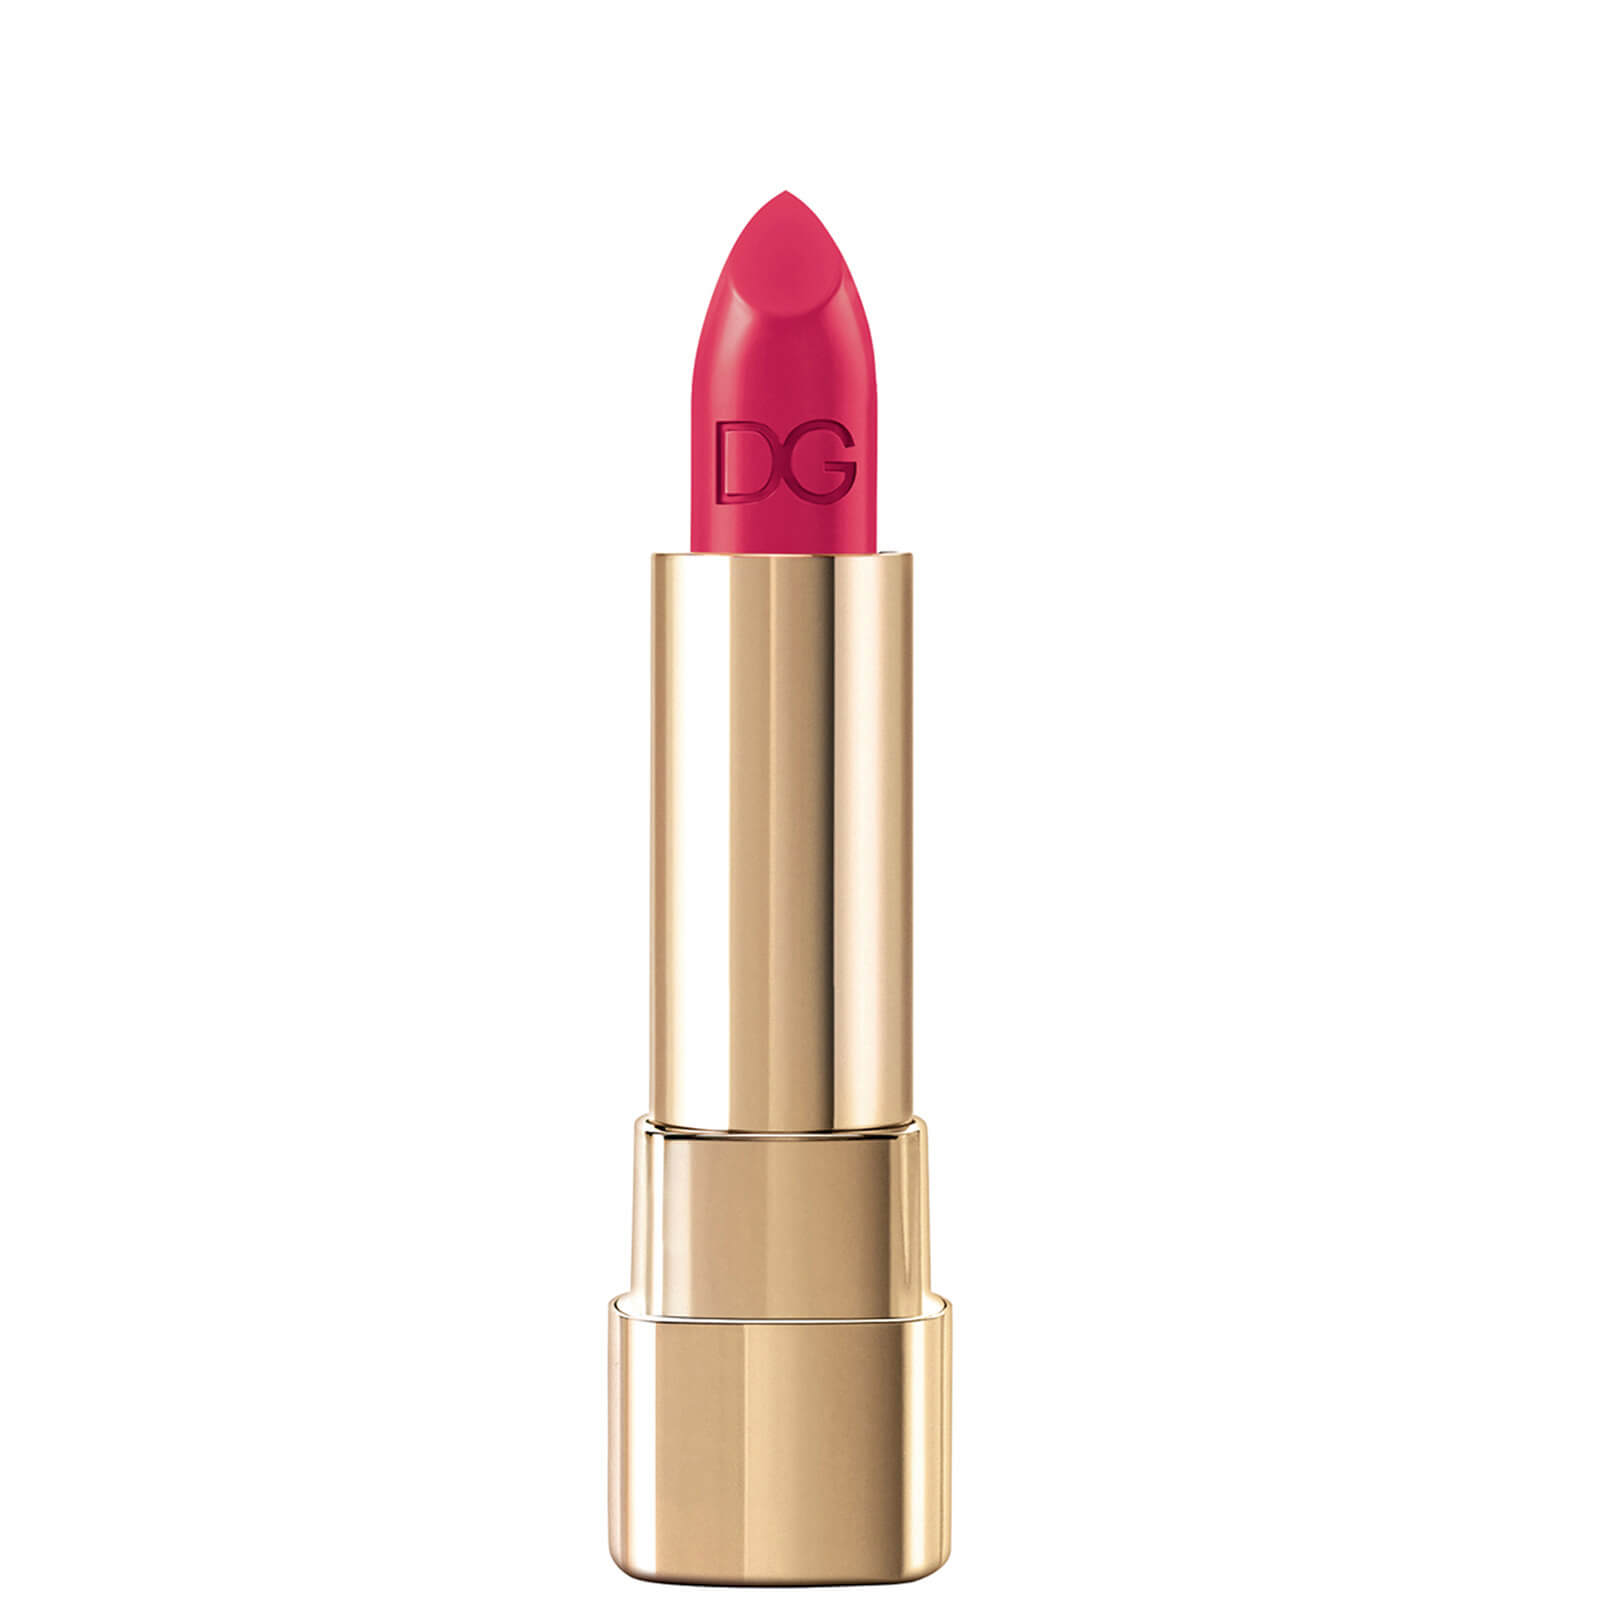 Dolce&Gabbana Classic Cream Lipstick 3.5g (Various Shades) - 245 Ballerina